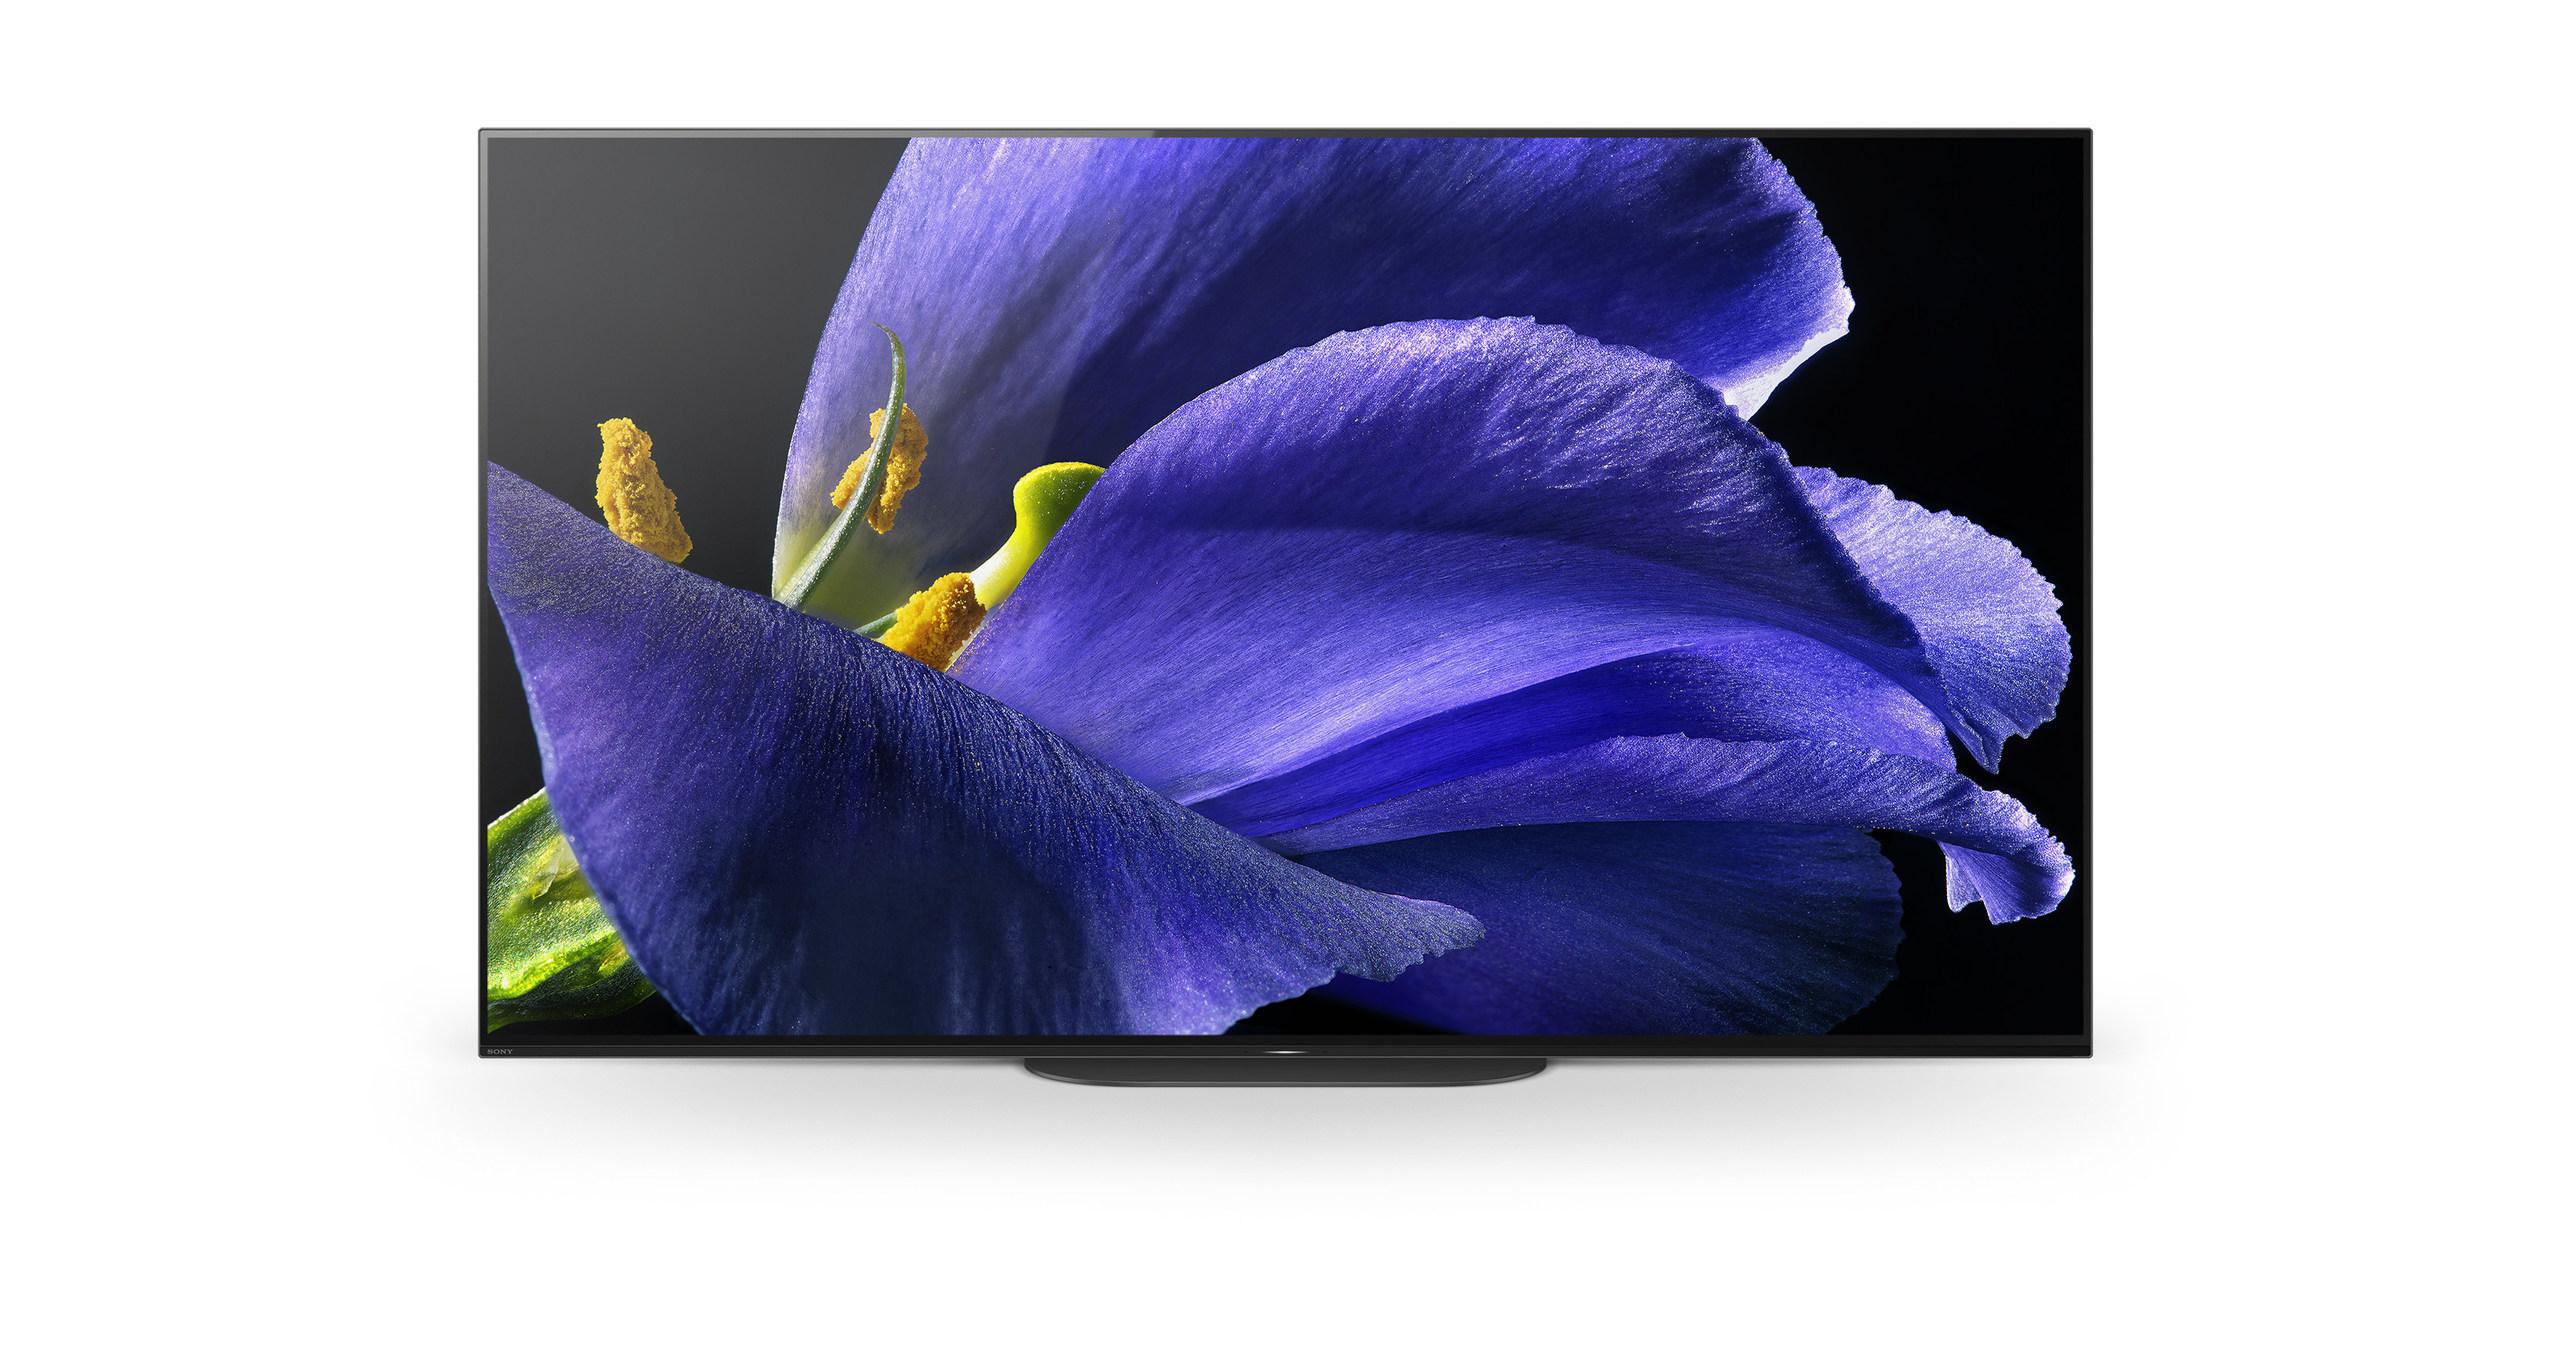 Sony Electronics Adds Super-large Sized 8K TVs and OLED 4K